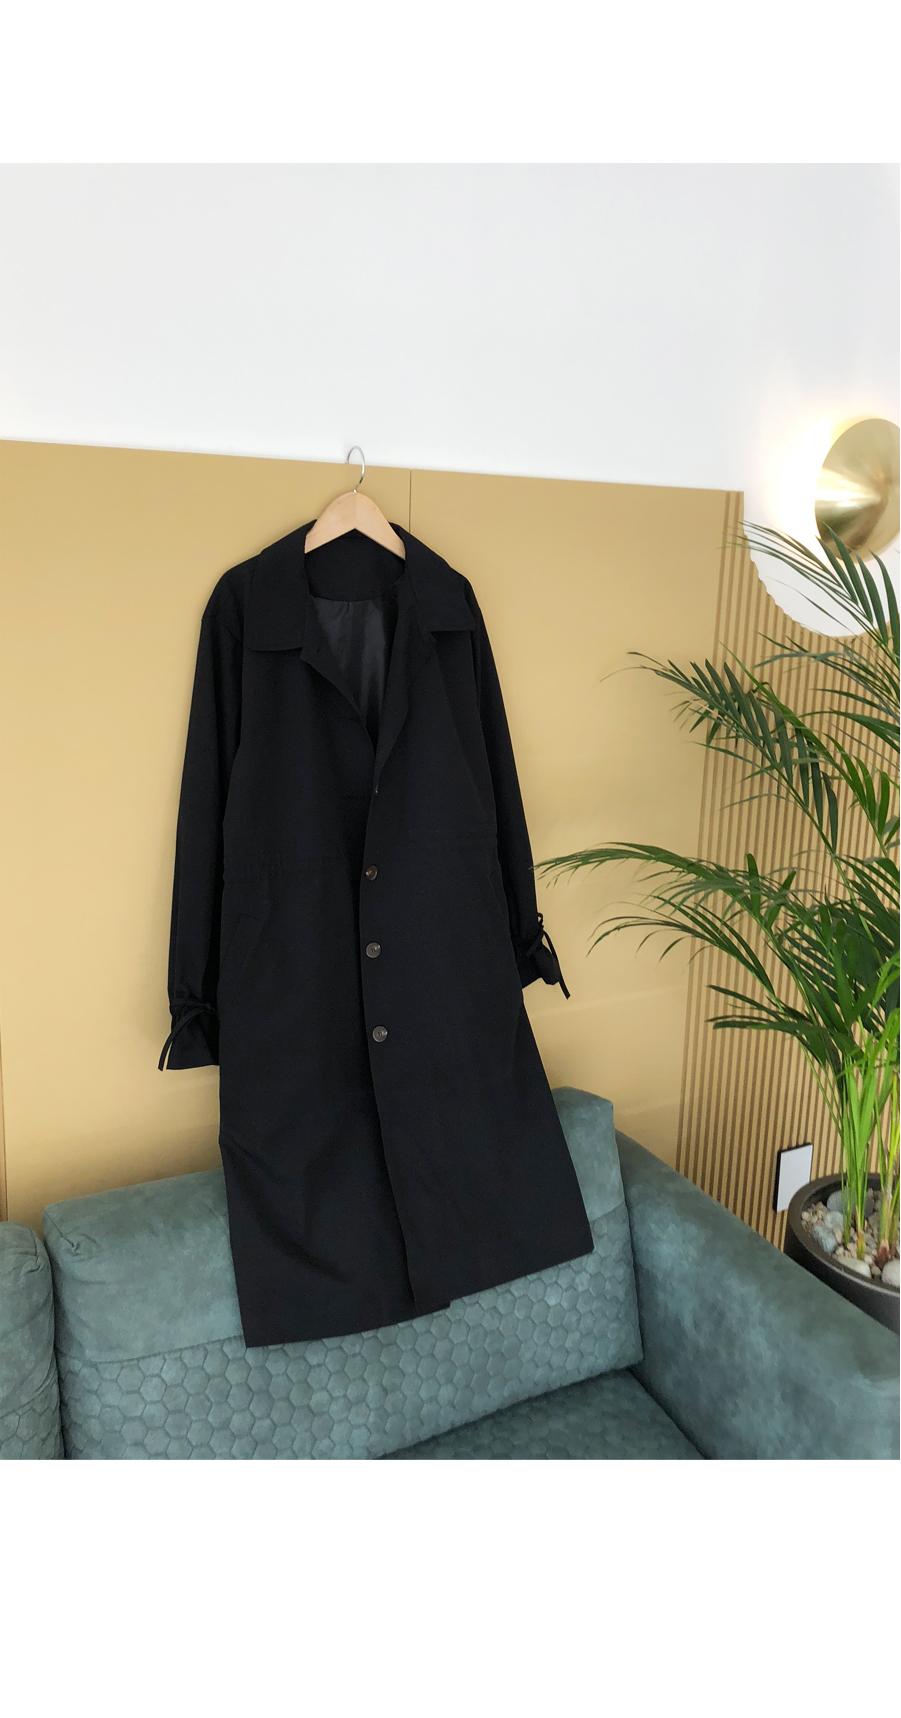 Veredan Day trench coat